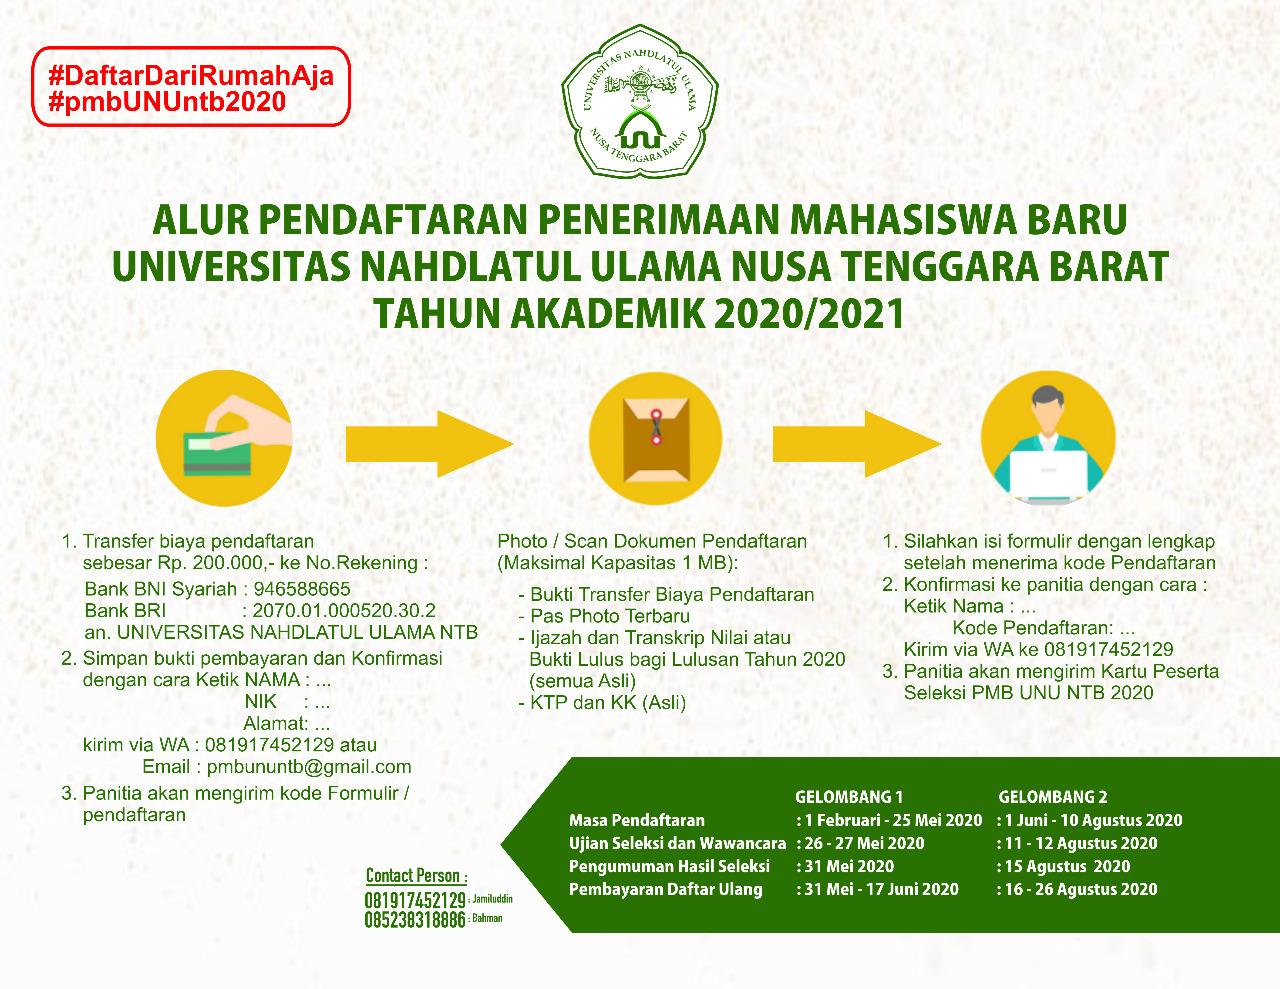 Alur Pendaftaran PMB Universitas Nahdlatul Ulama NTB Tahun Akademik 2020/2021